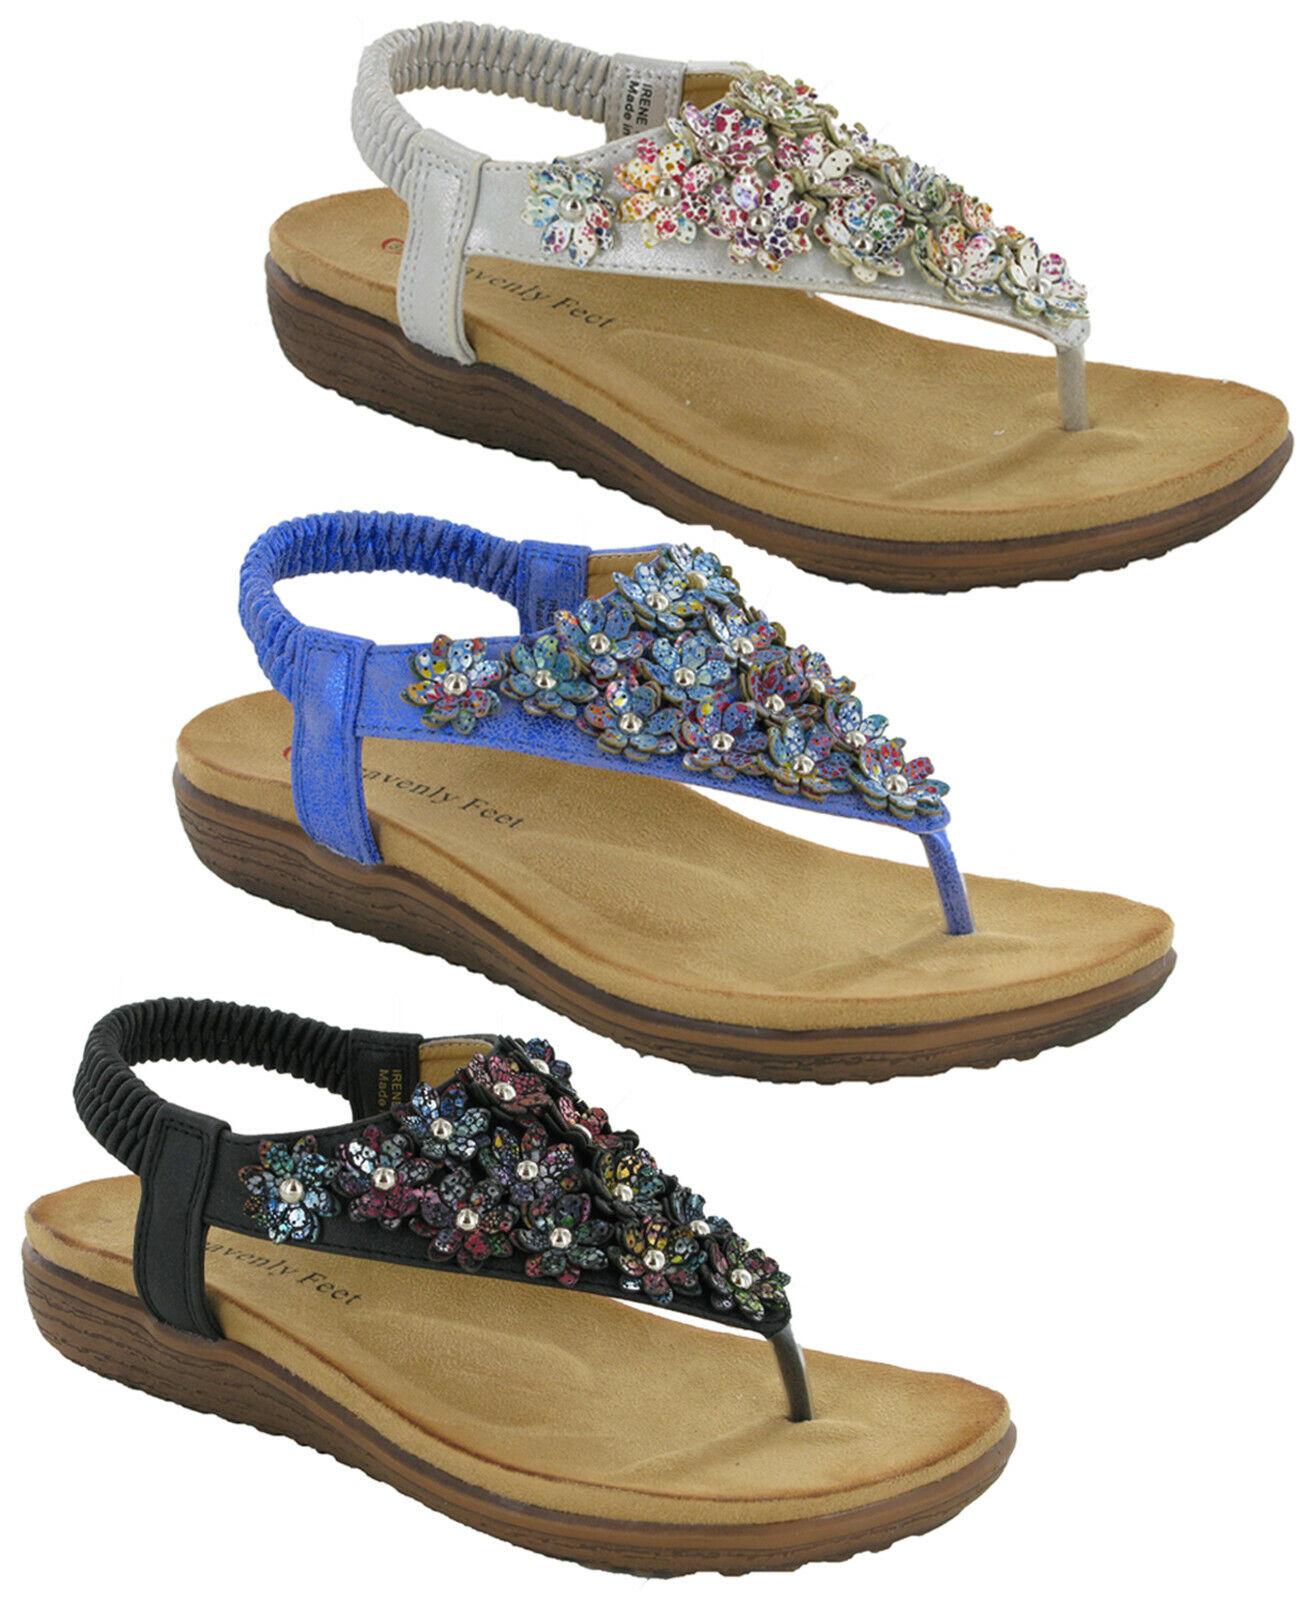 Heavenly Feet Irene Ladies Sandals Flip Flops Padded Cushioned Comfort Shoes